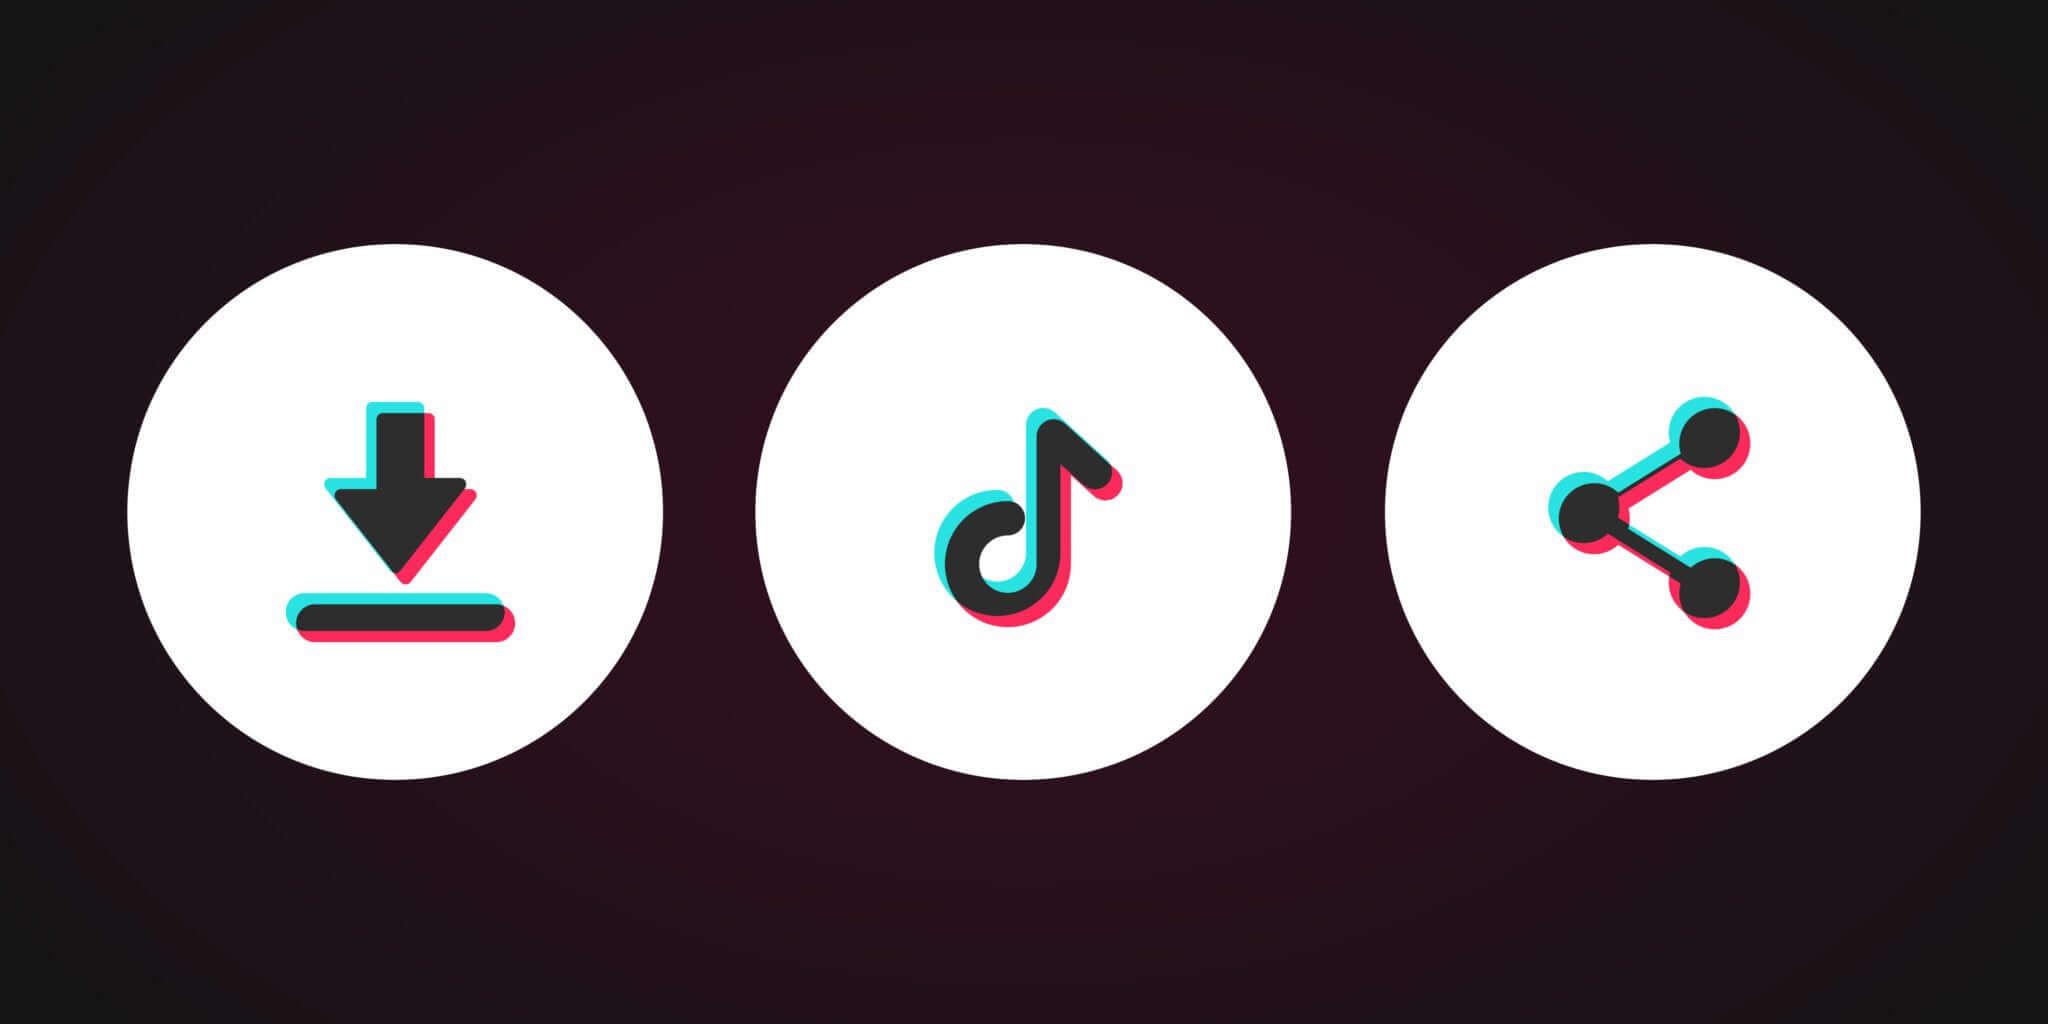 Social Media Platforms: Is TikTok the Most Popular One?